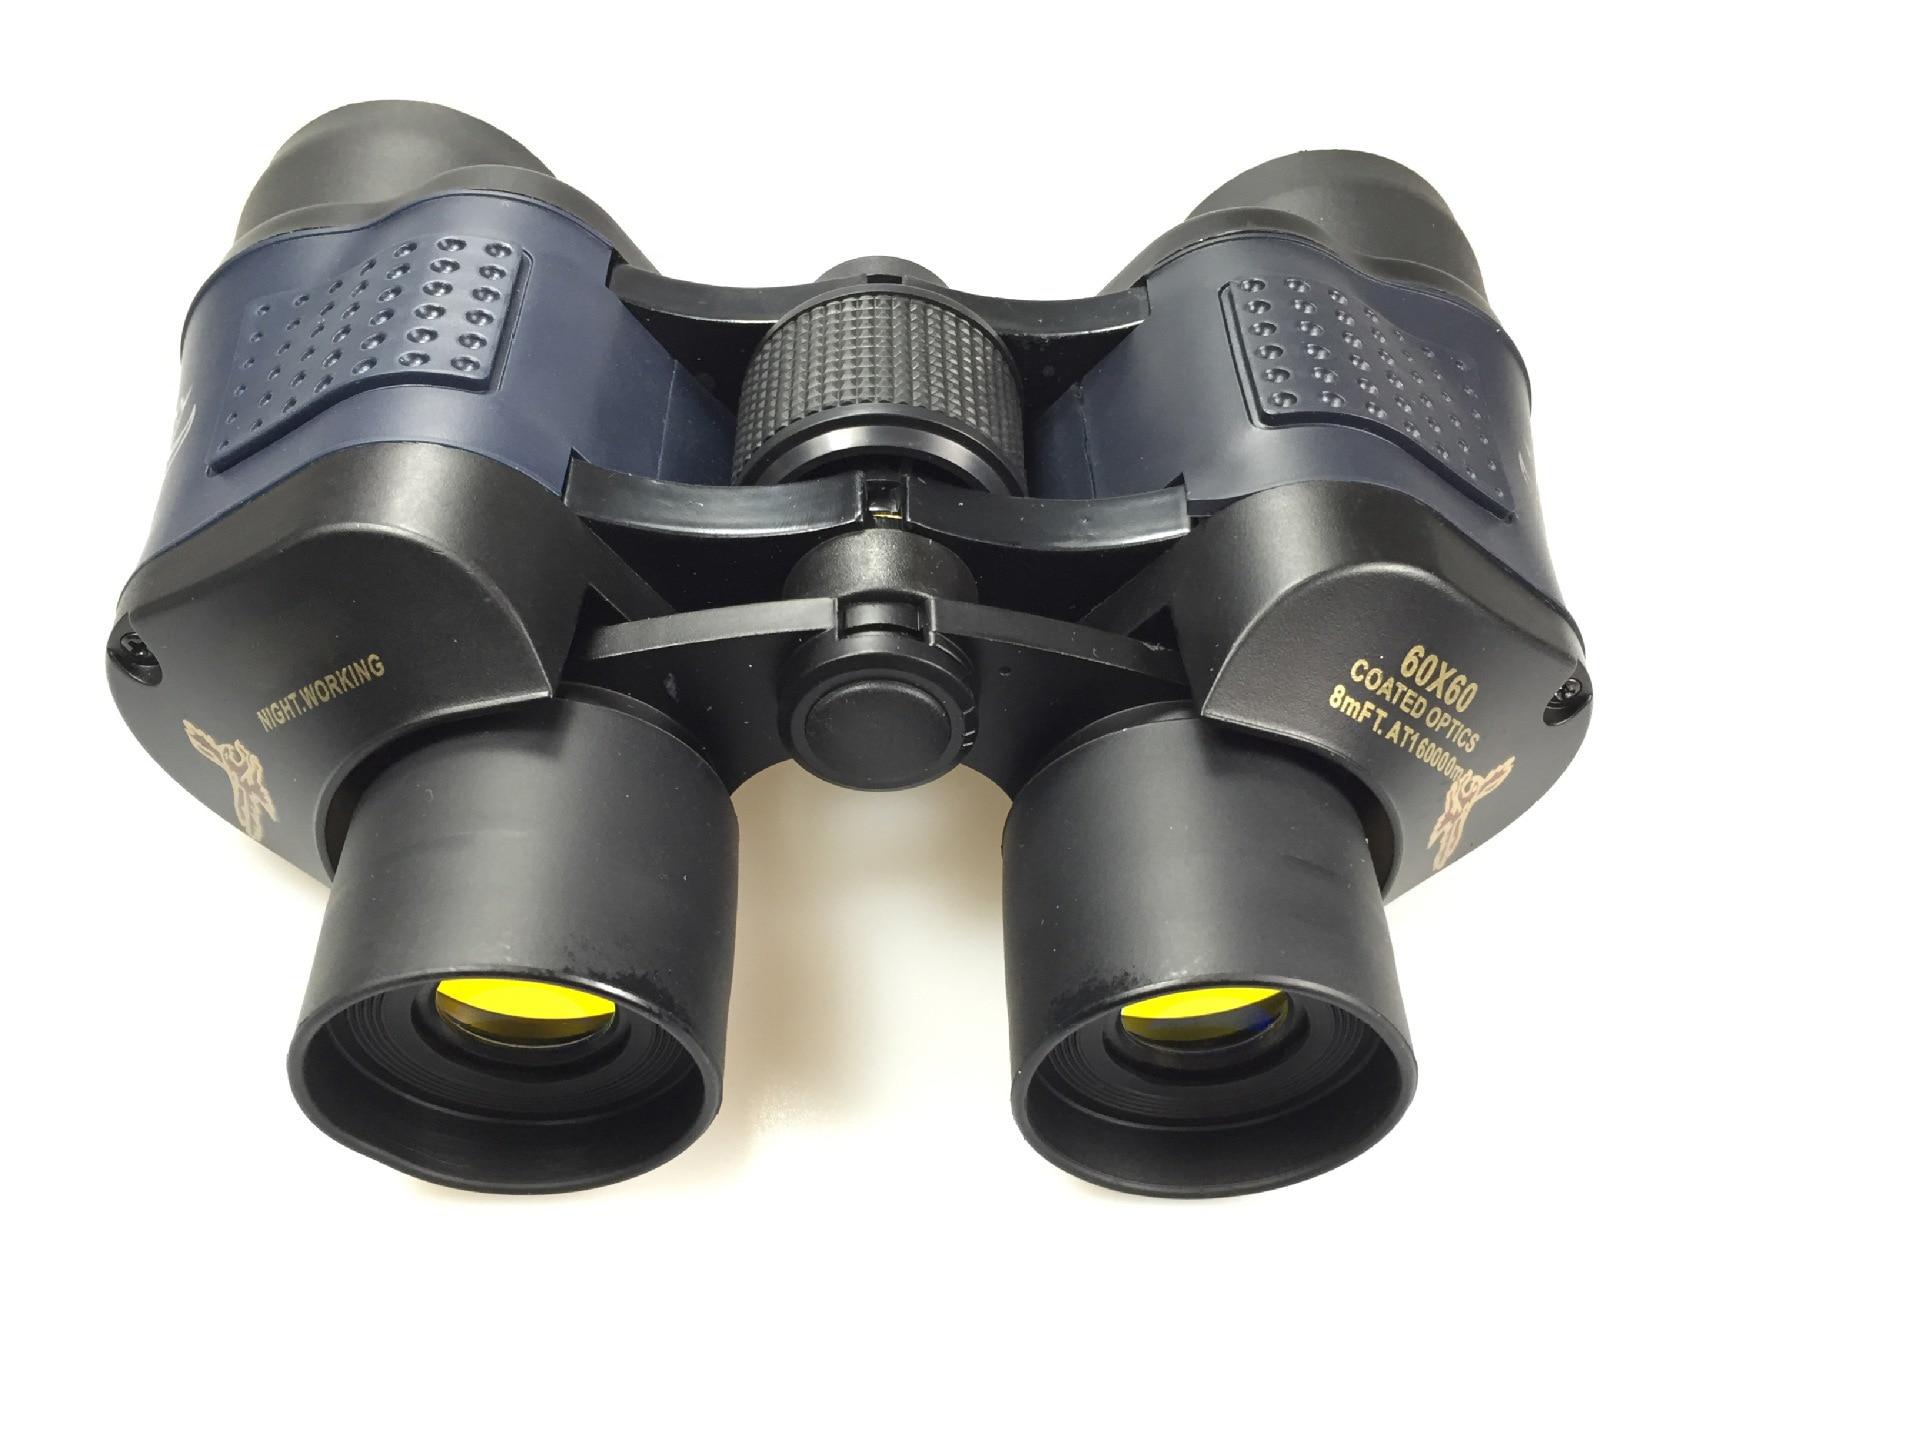 Mixout fernglas teleskop hohe klarheit mt beobachtung